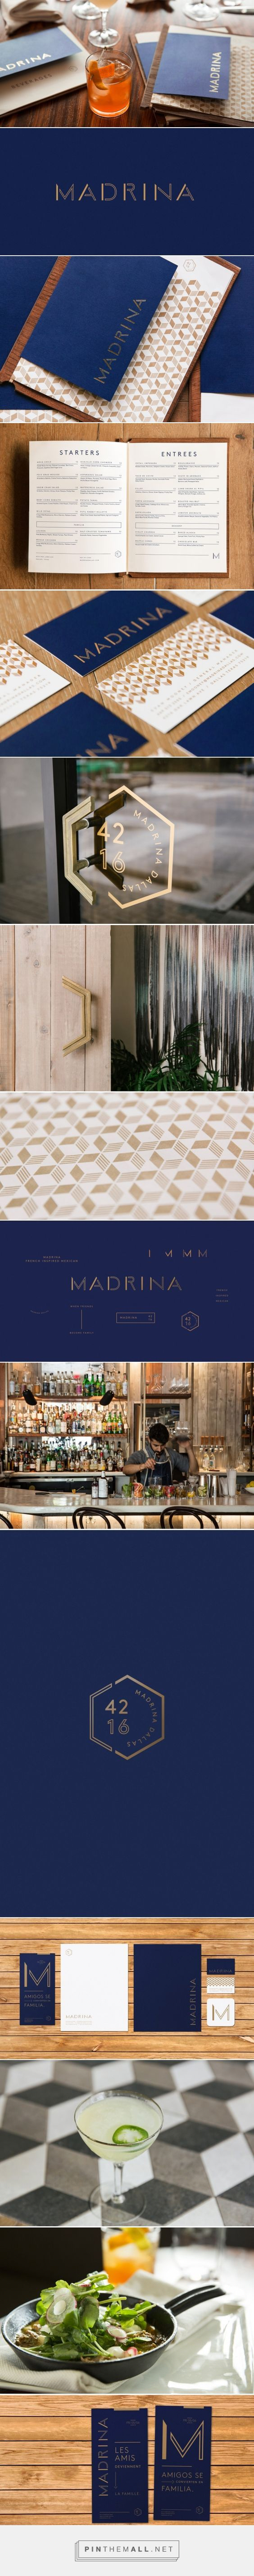 Madrina Restaurant Branding by Mast | Fivestar Branding – Design and Branding Agency & Inspiration Gallery: